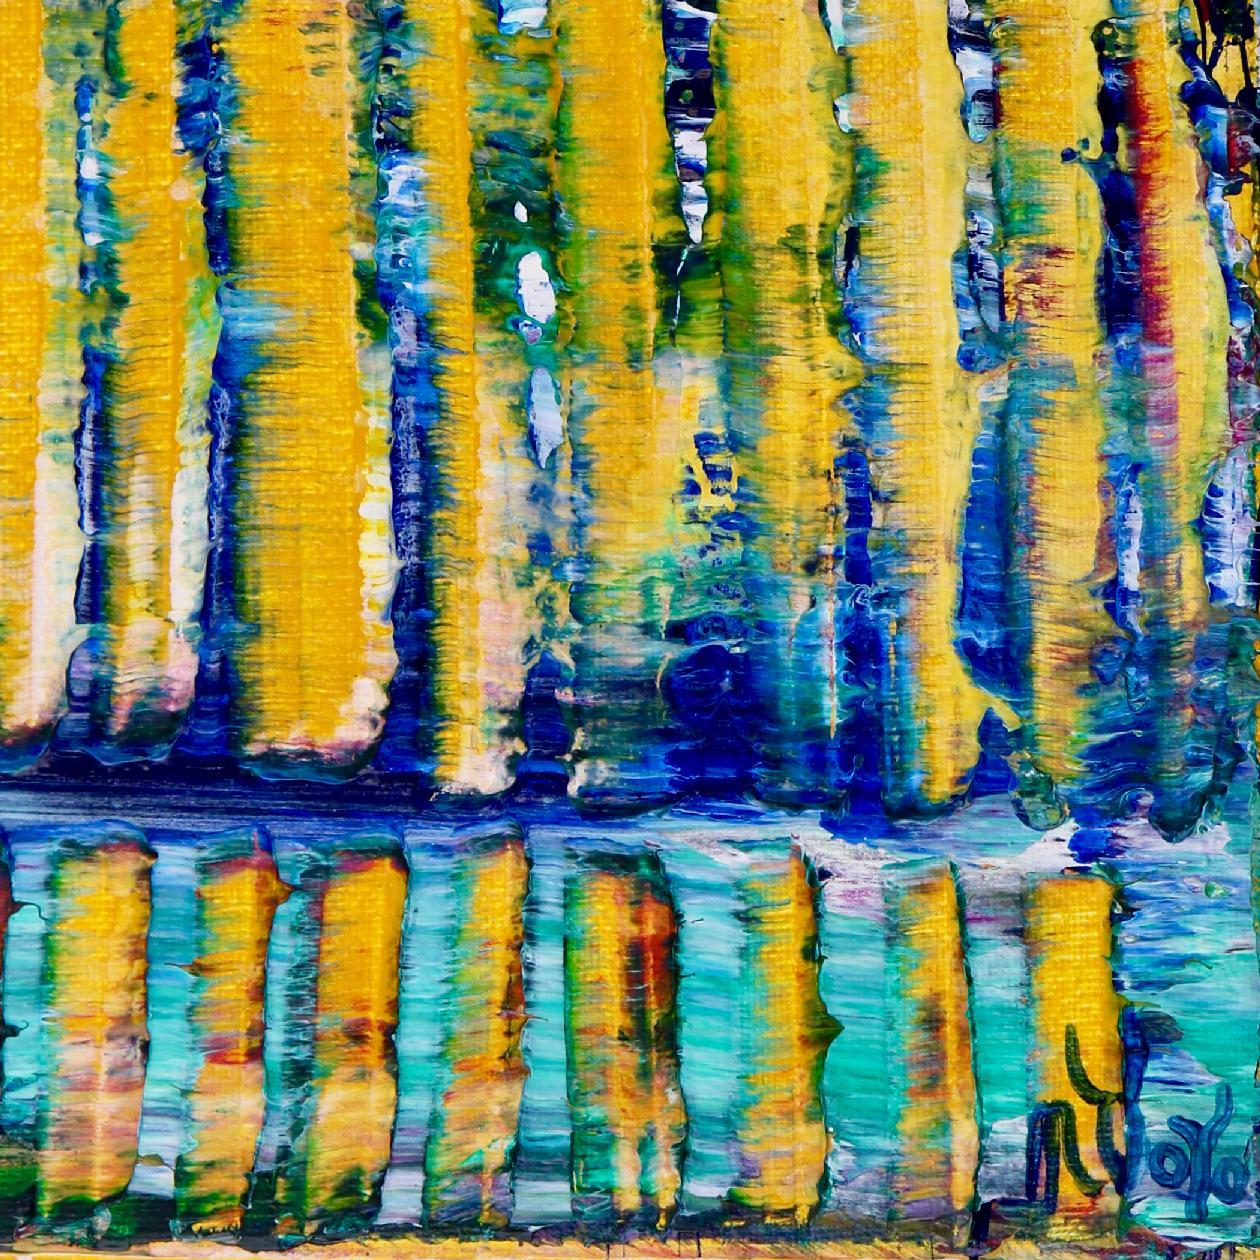 SOLD - Blinding Yellow Lights (2020) by Nestor Toro